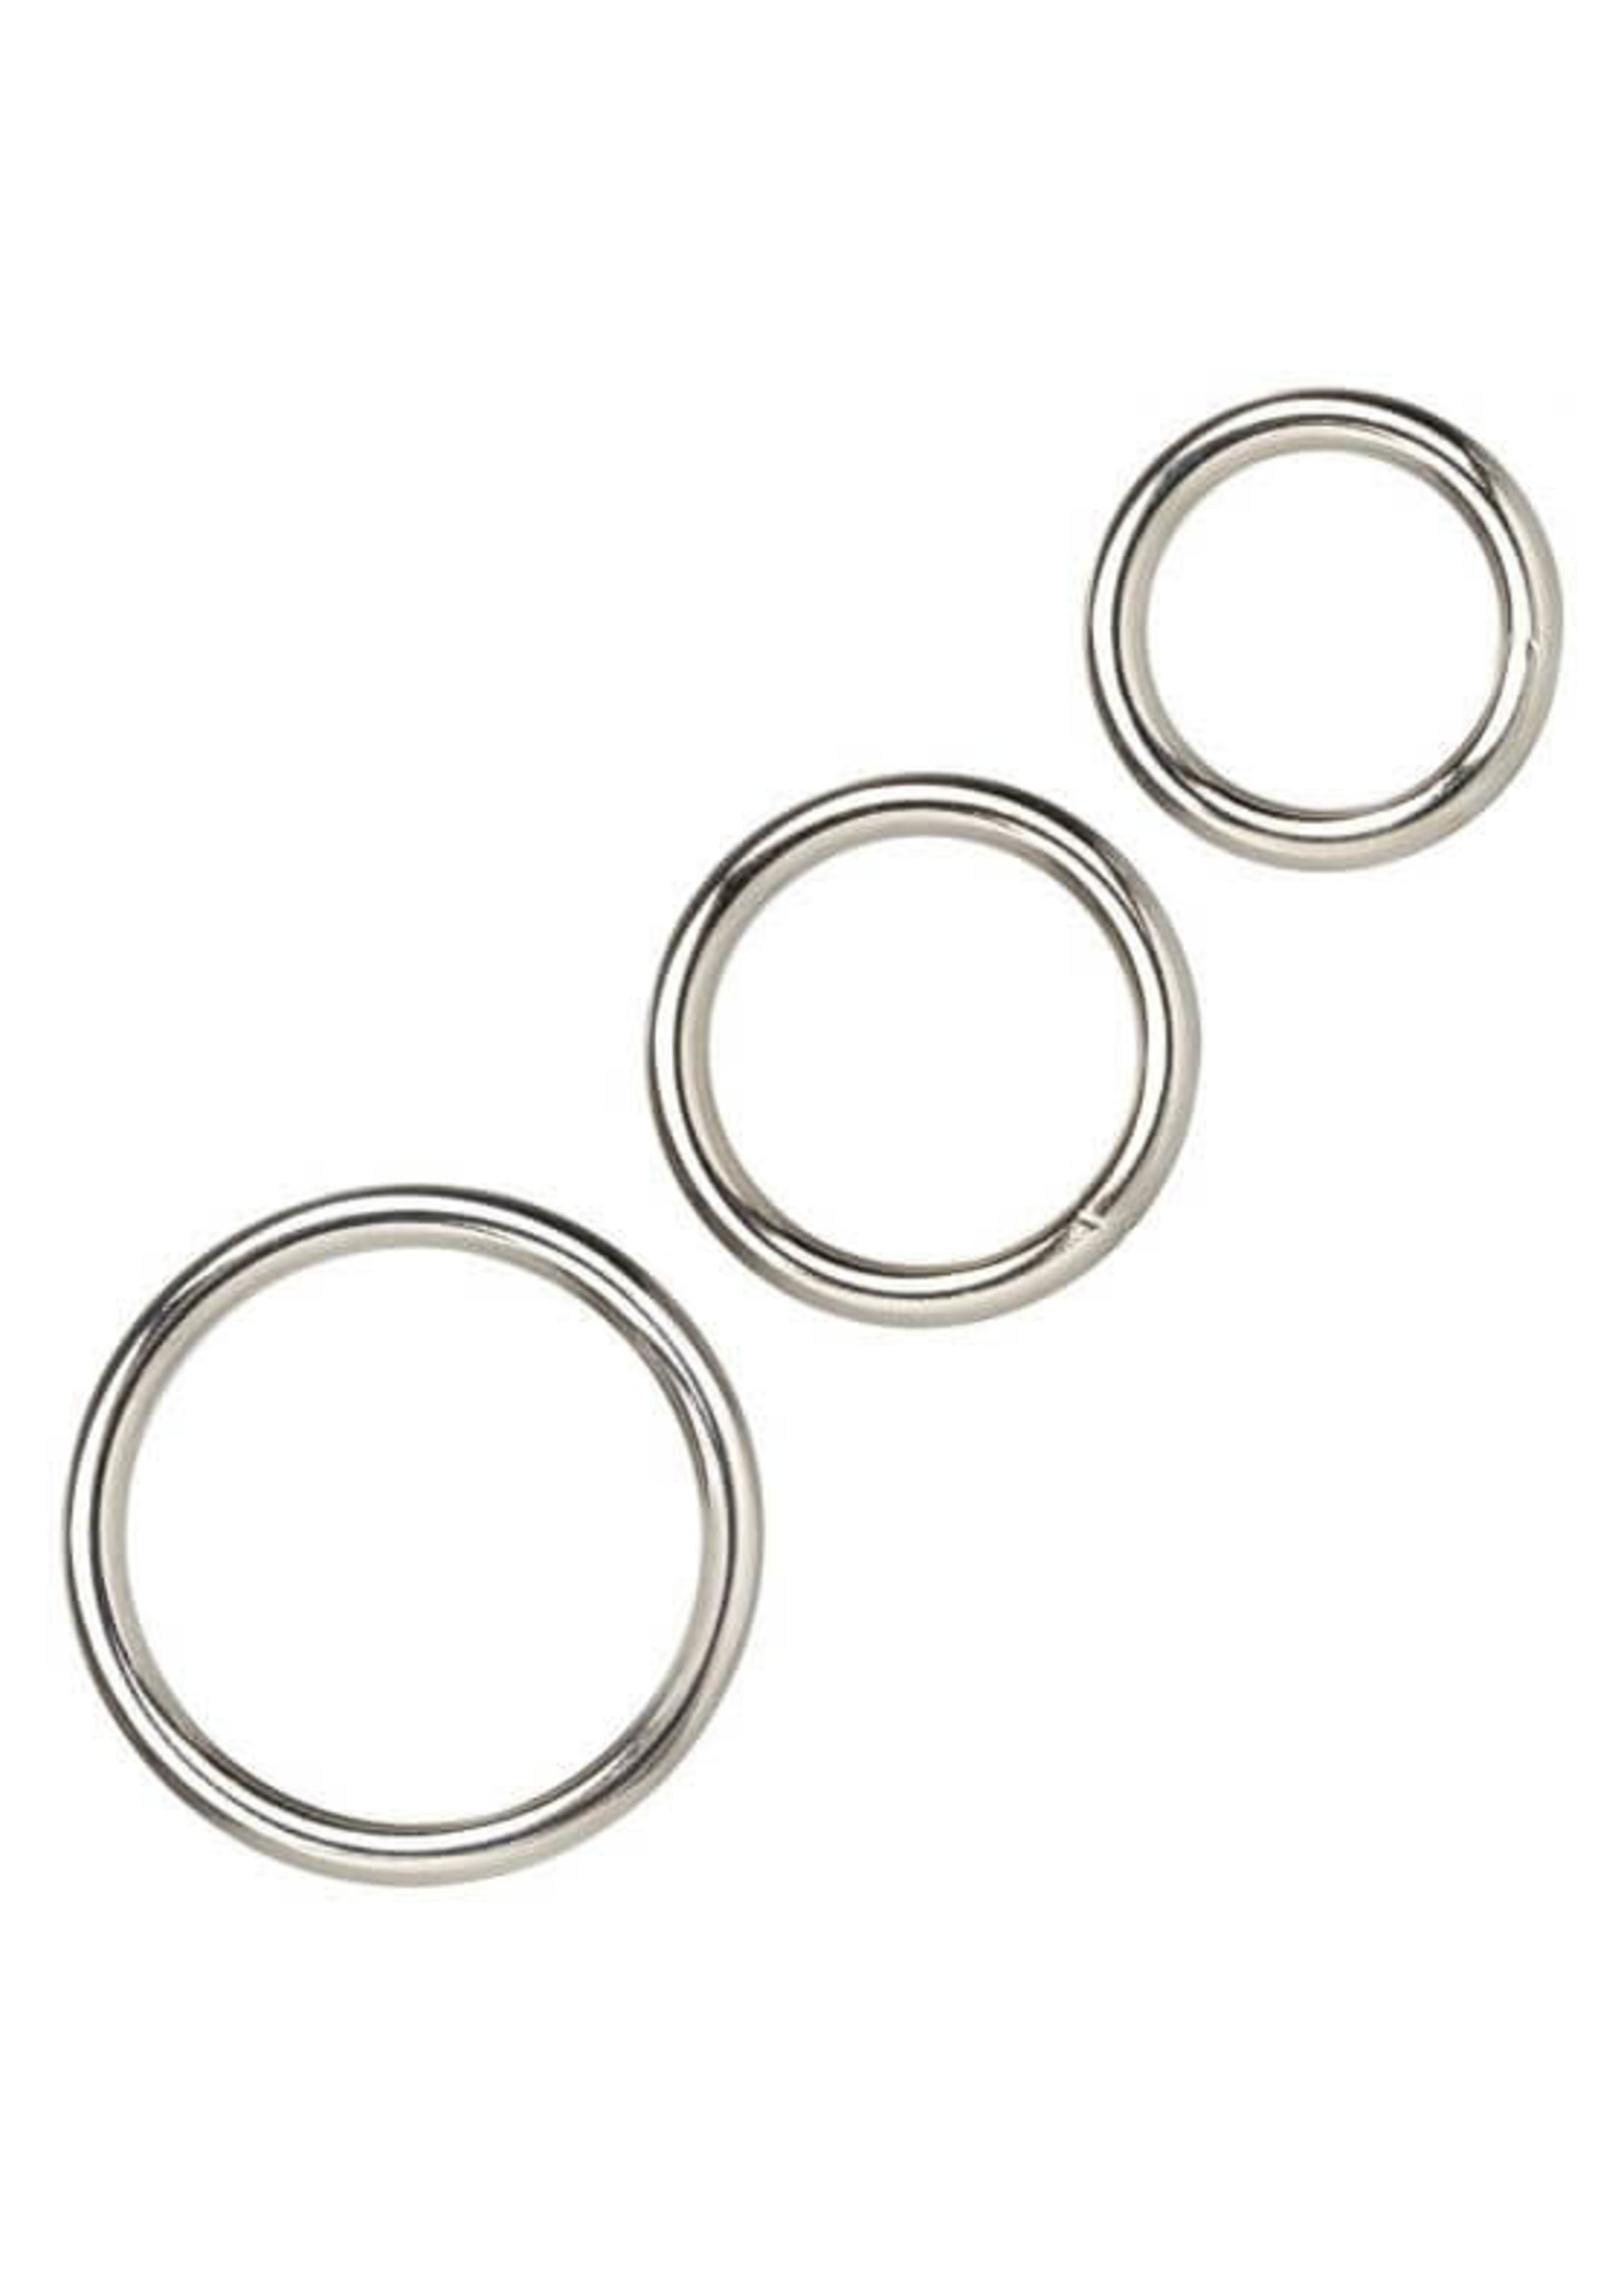 Cal Exotic Novelties Silver Ring Set